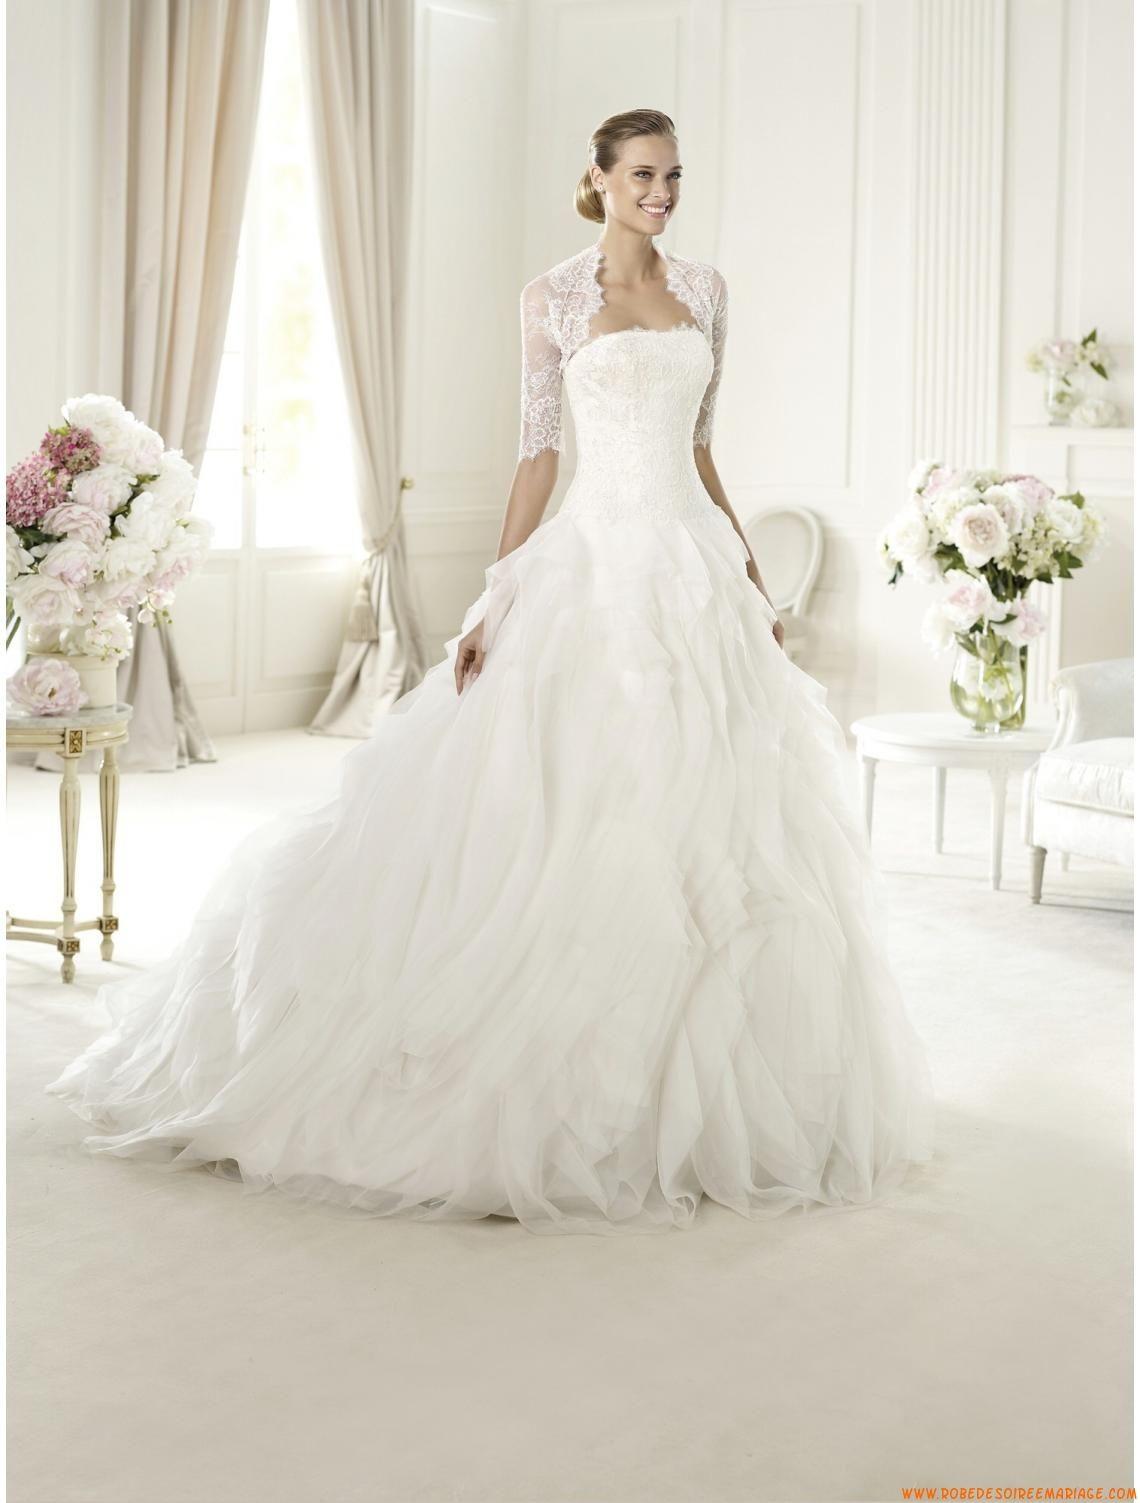 robe de mari e originale organza avec bol ro dentelle robe de mari e pinterest bolero. Black Bedroom Furniture Sets. Home Design Ideas